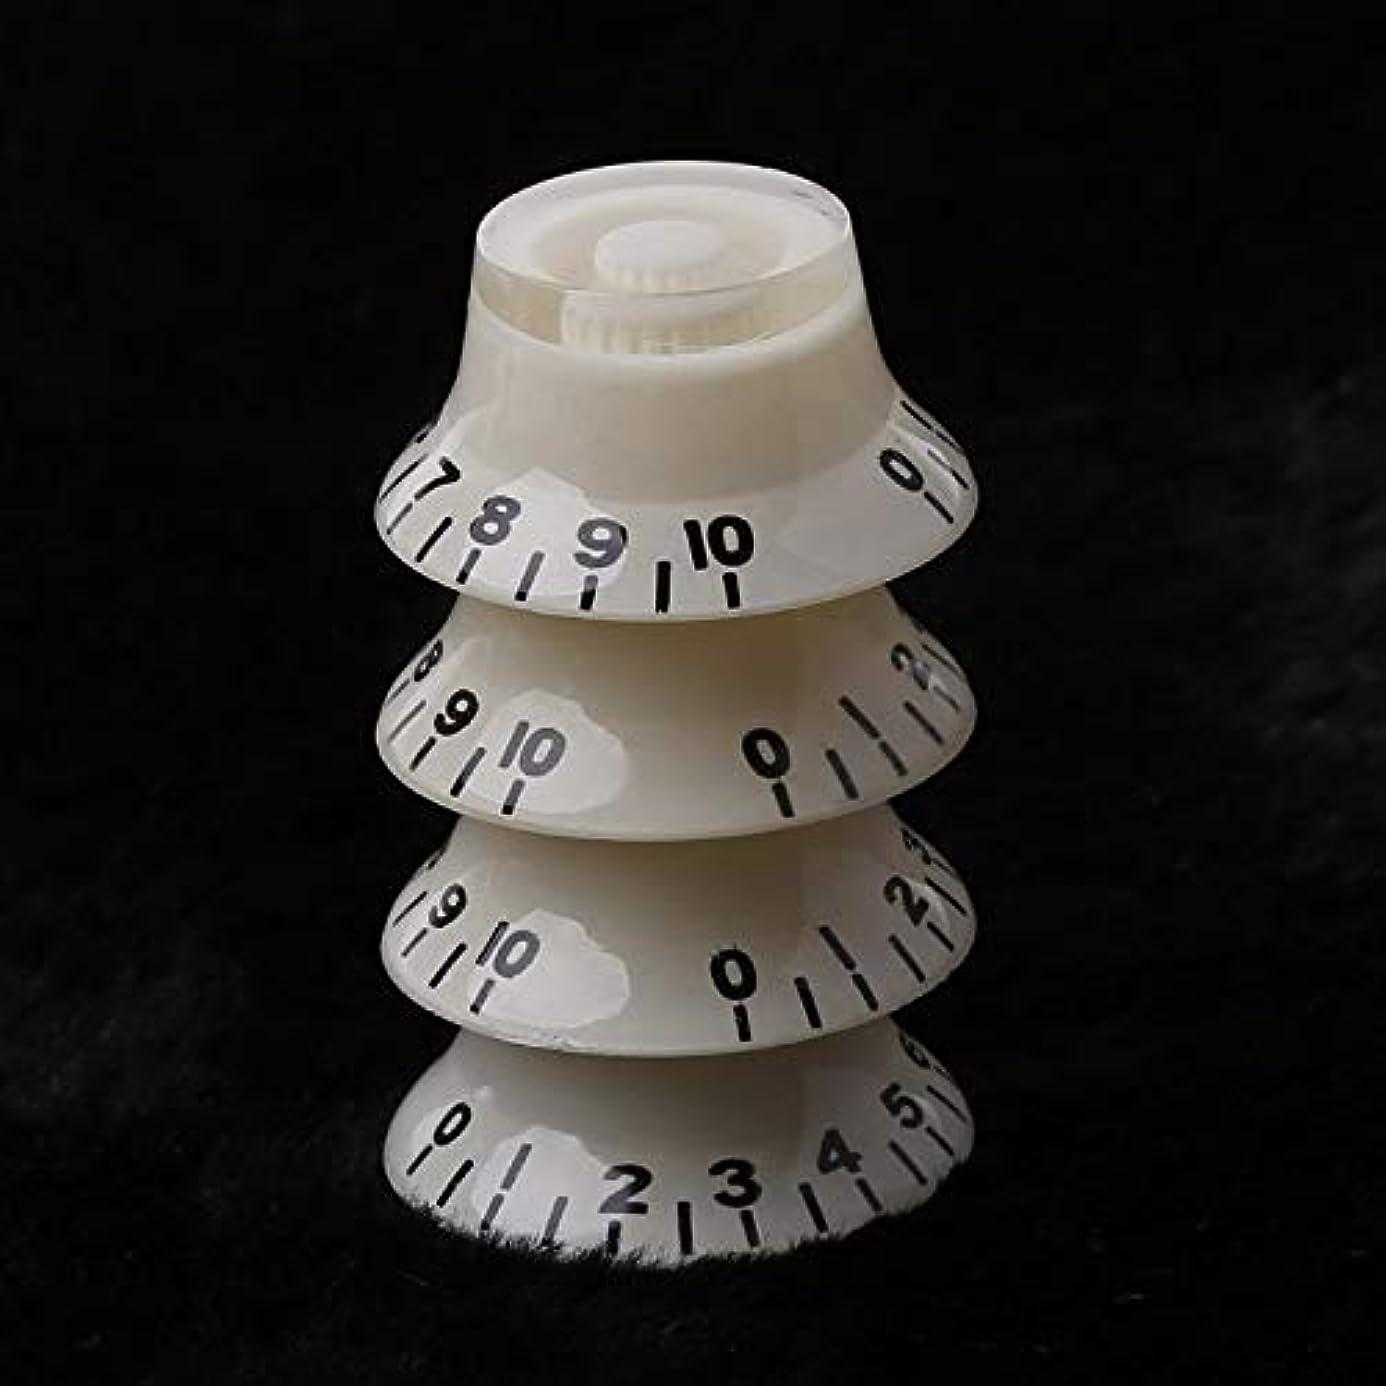 Susie-Smile - 1pc Knob Button Bell Shape Guitar Tone Volume Control For LP Guitar Parts White Black